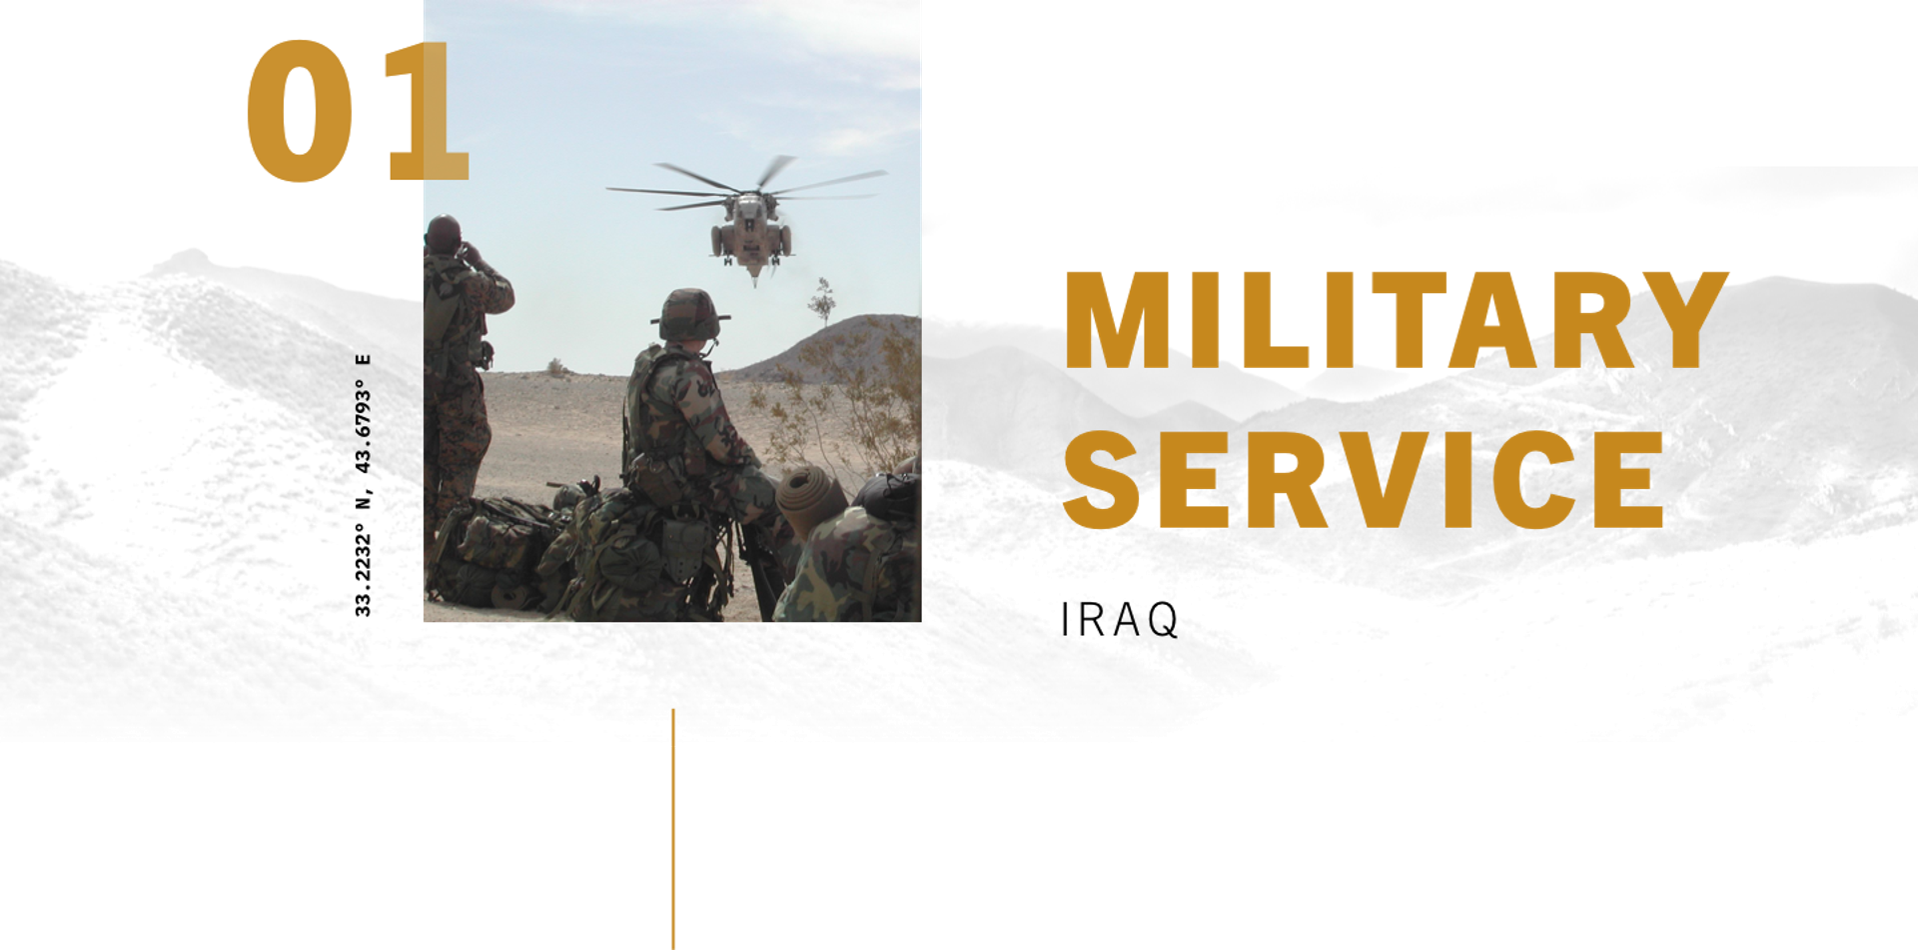 MILITARY SERVICE, IRAQ